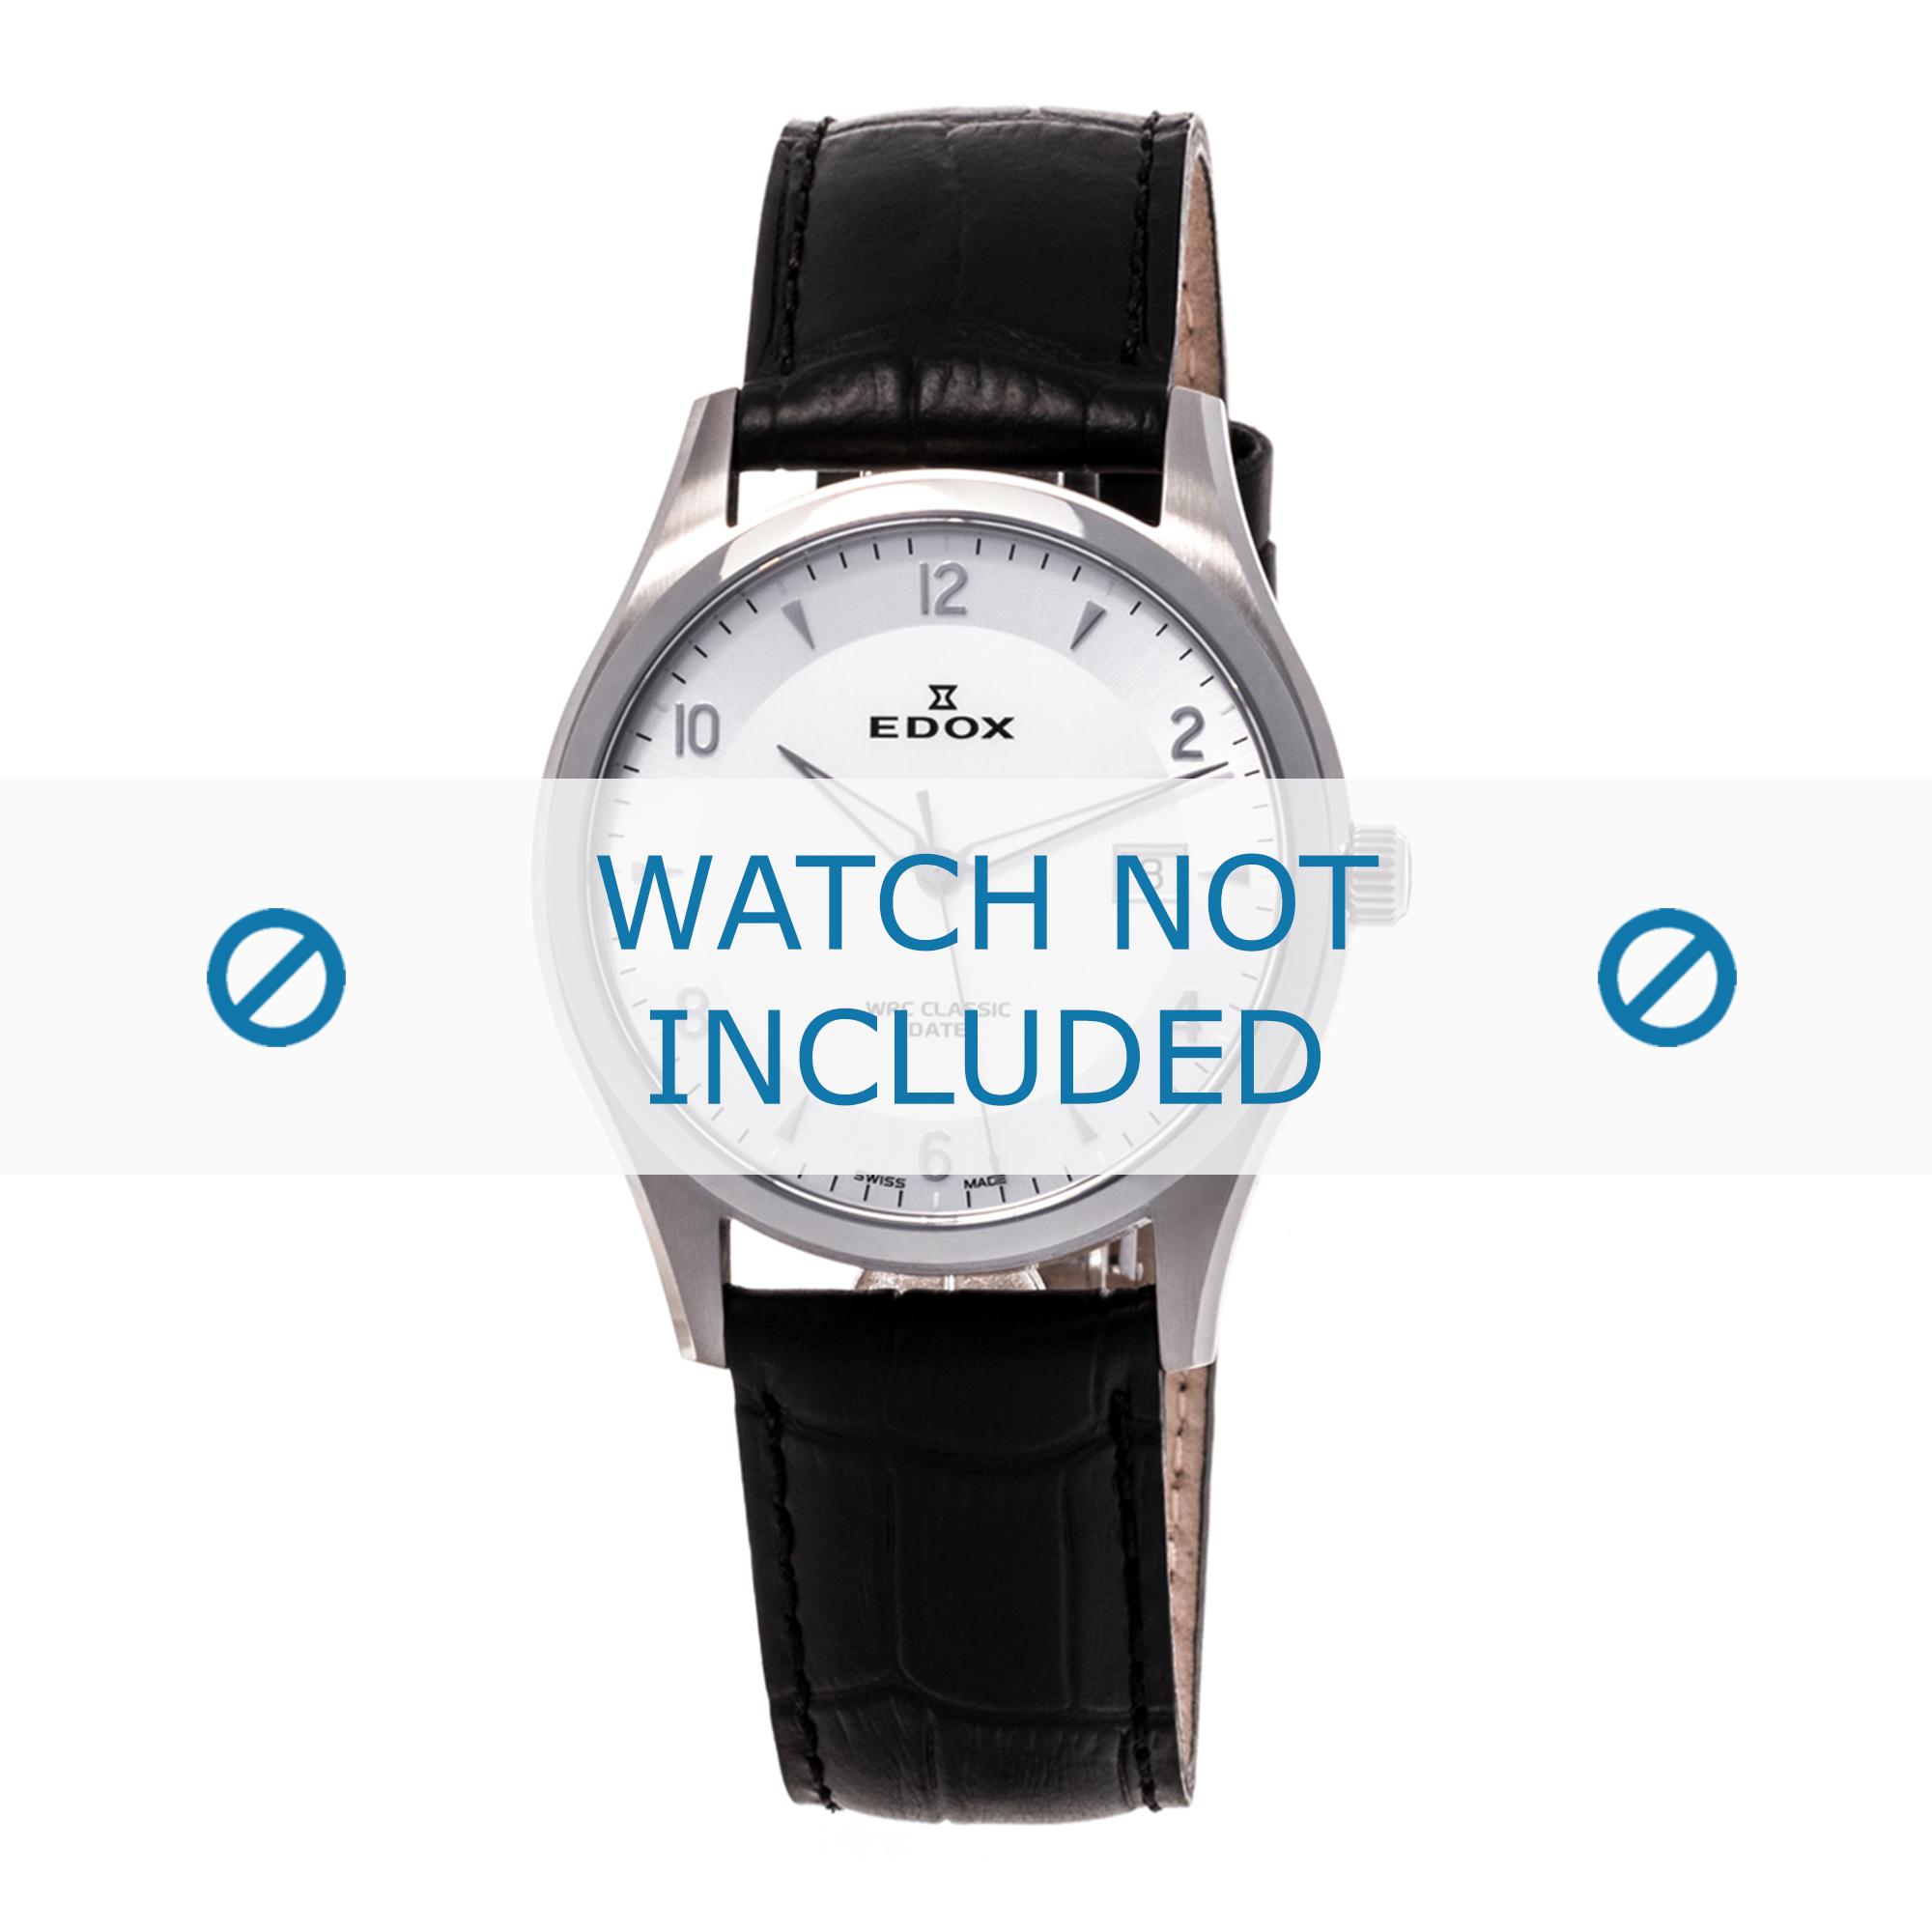 Edox horlogeband 70170-3-AIN-WRC Leder Zwart 21mm + standaard stiksel